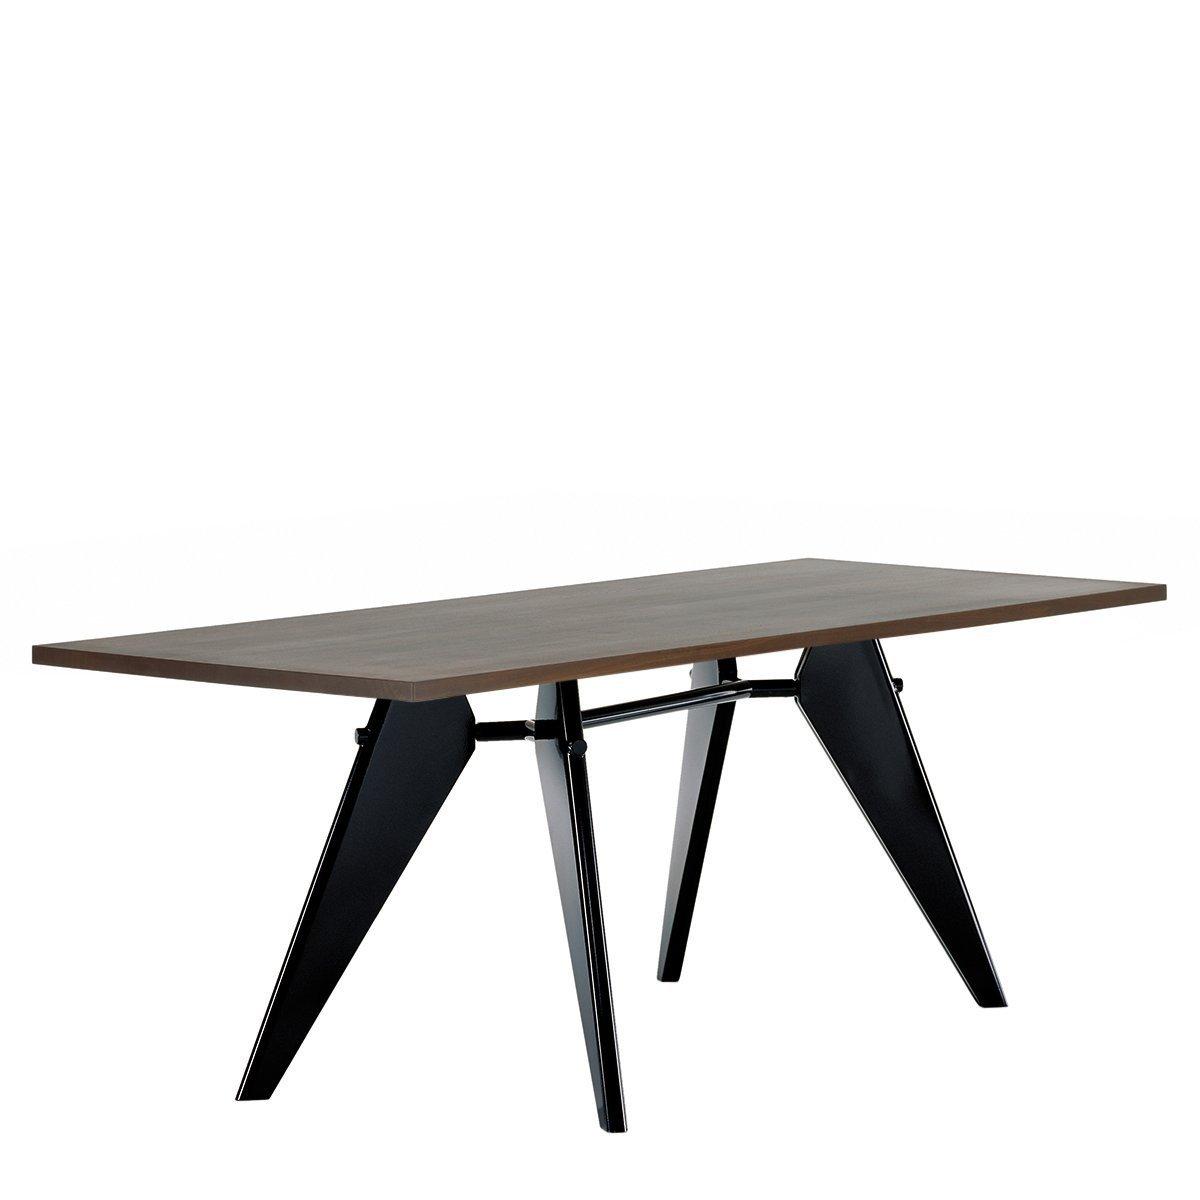 Vitra EM Eettafel - Gerookt Eiken - Zwart - 180 x 90 cm.